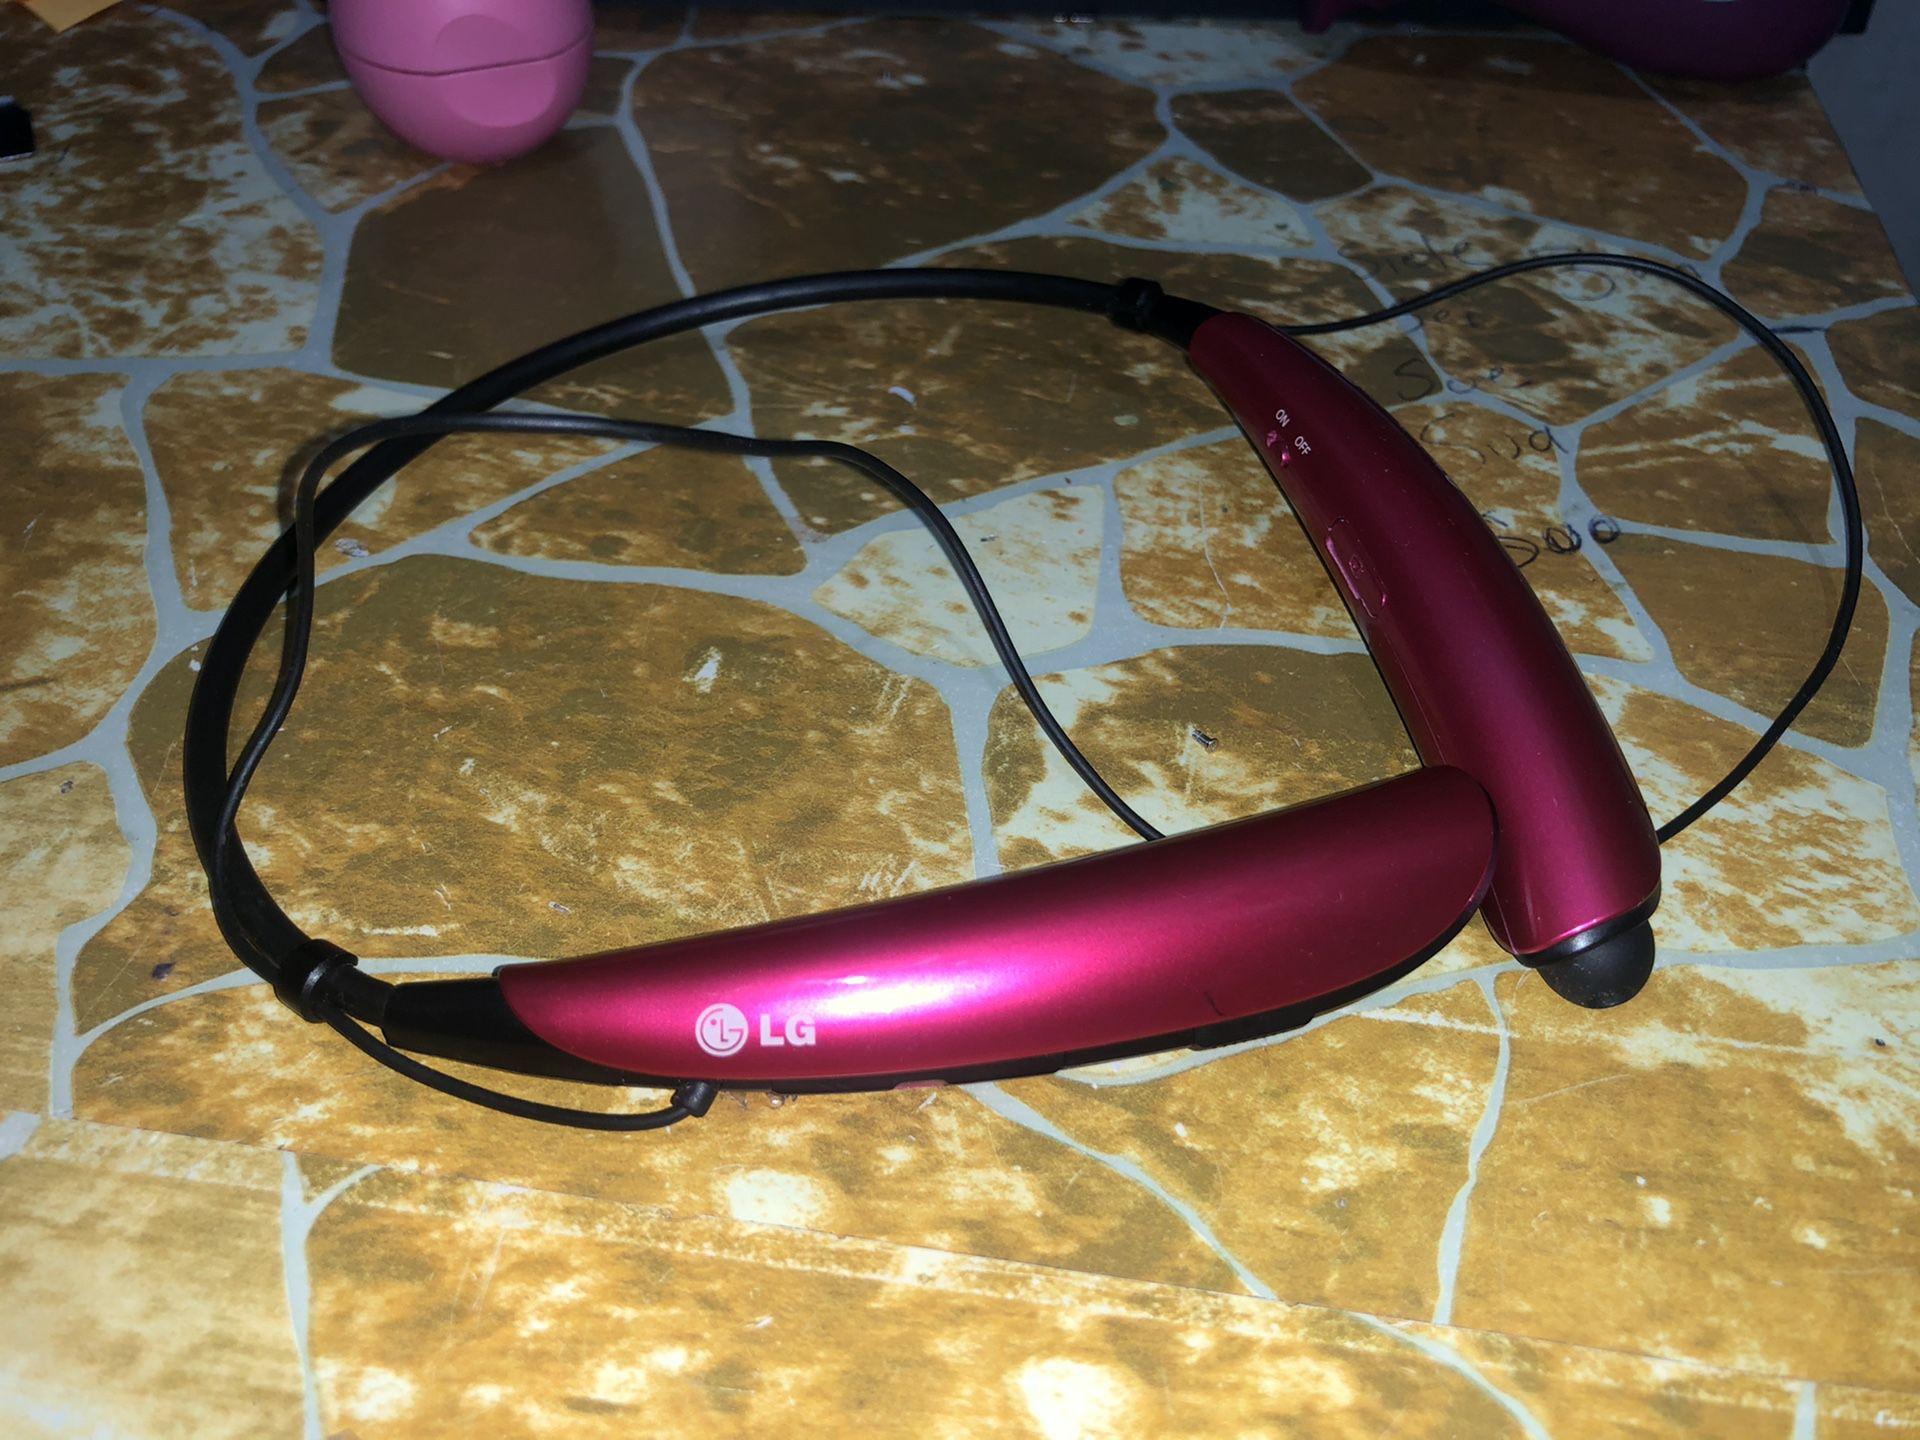 LG Bluetooth headsets